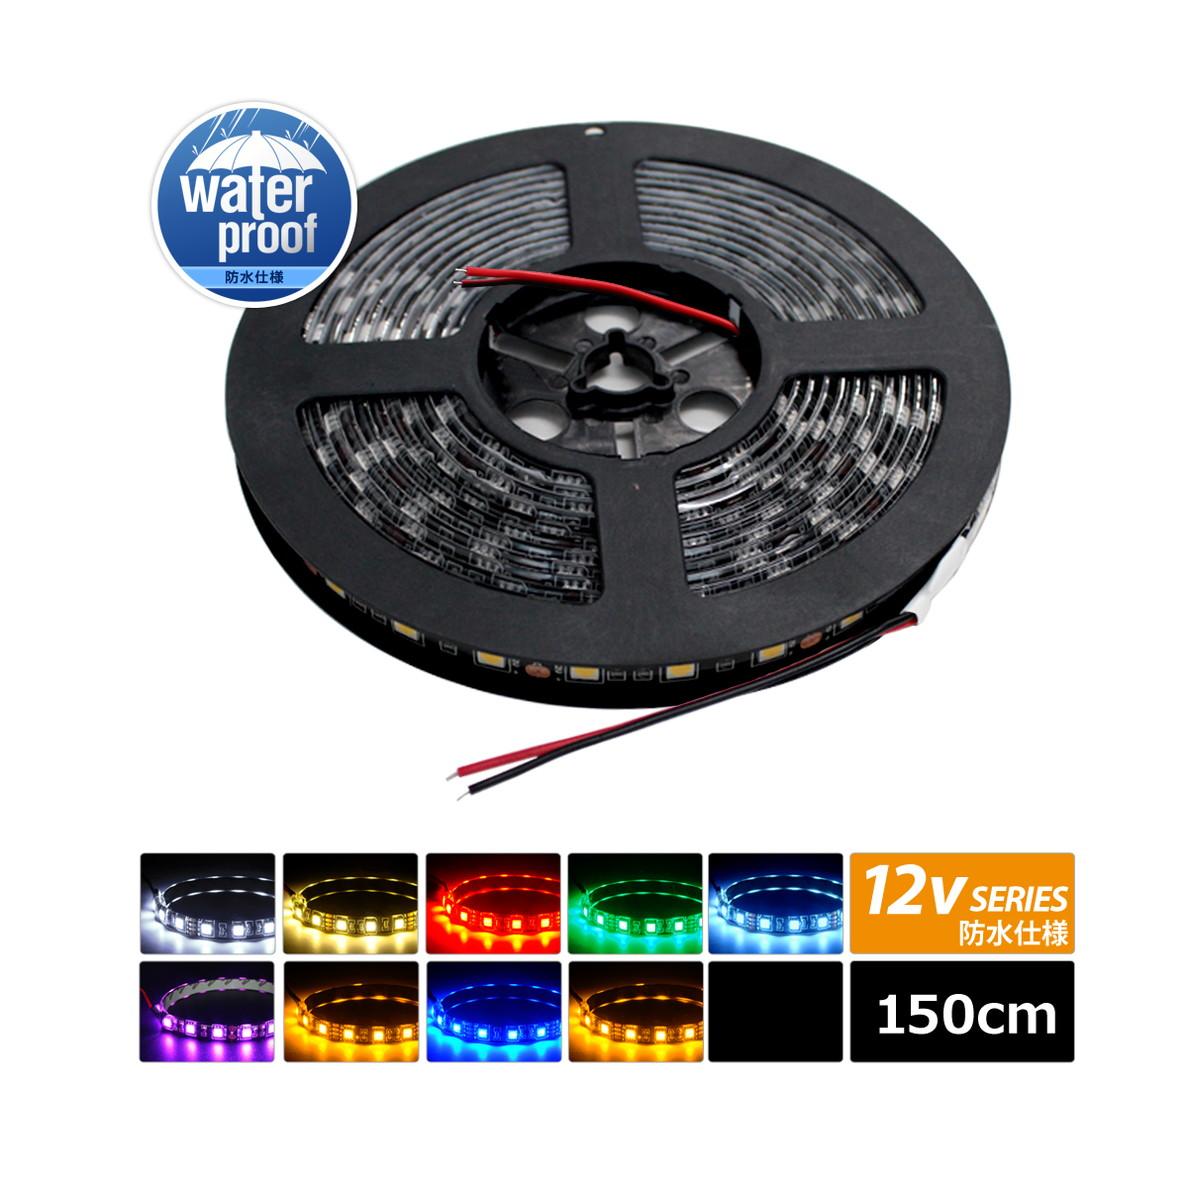 [150cm×1本] 超安12V 防水 LEDテープライト 3チップ 150cm [黒ベース | ケーブル12cm]